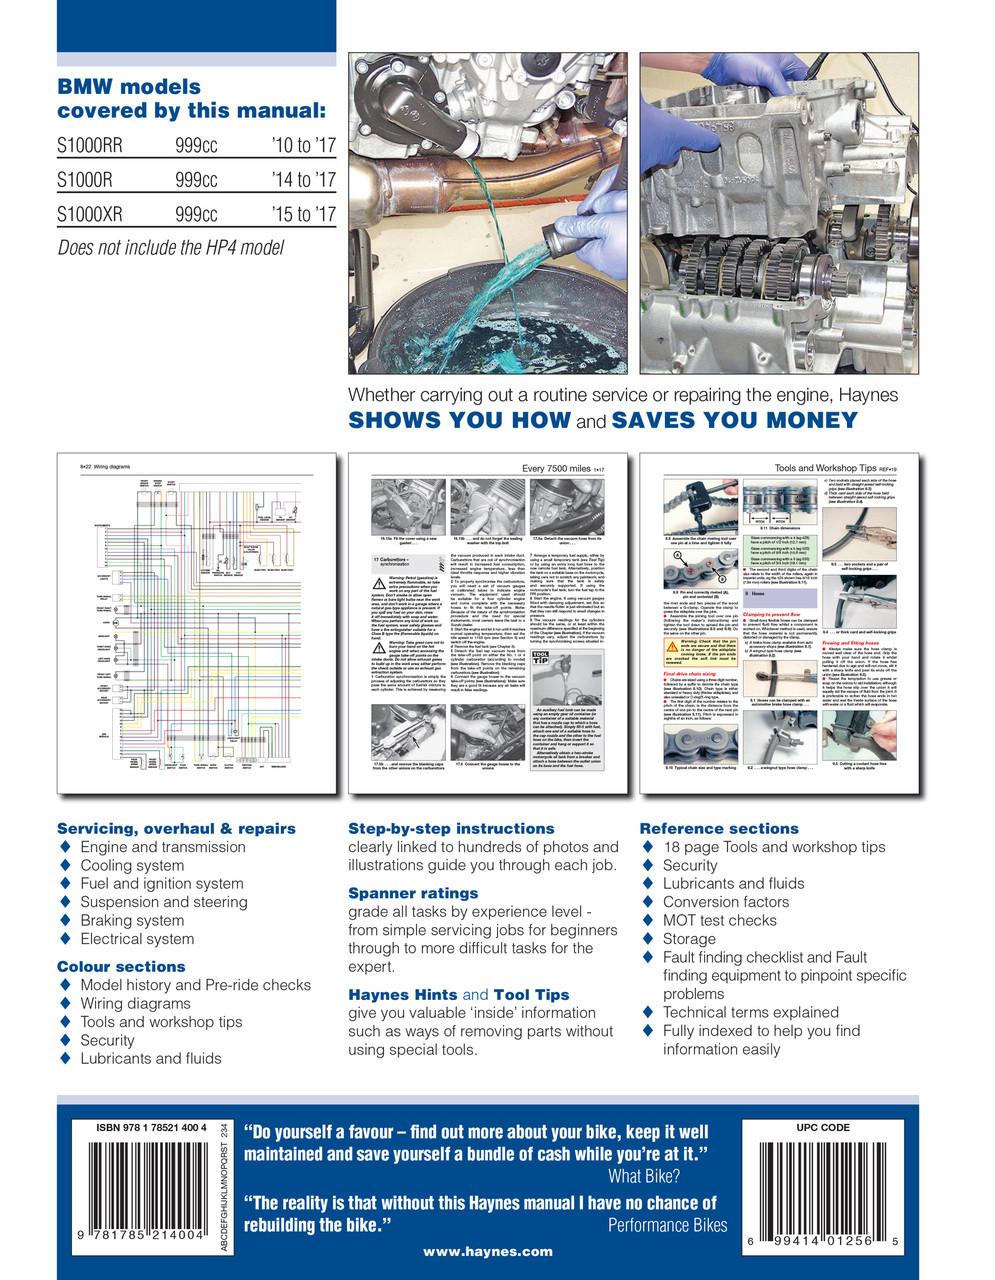 bmw s1000rr s1000r s1000xr 2010 2017 workshop manual bmw 2002 wiring diagram pdf [ 995 x 1280 Pixel ]